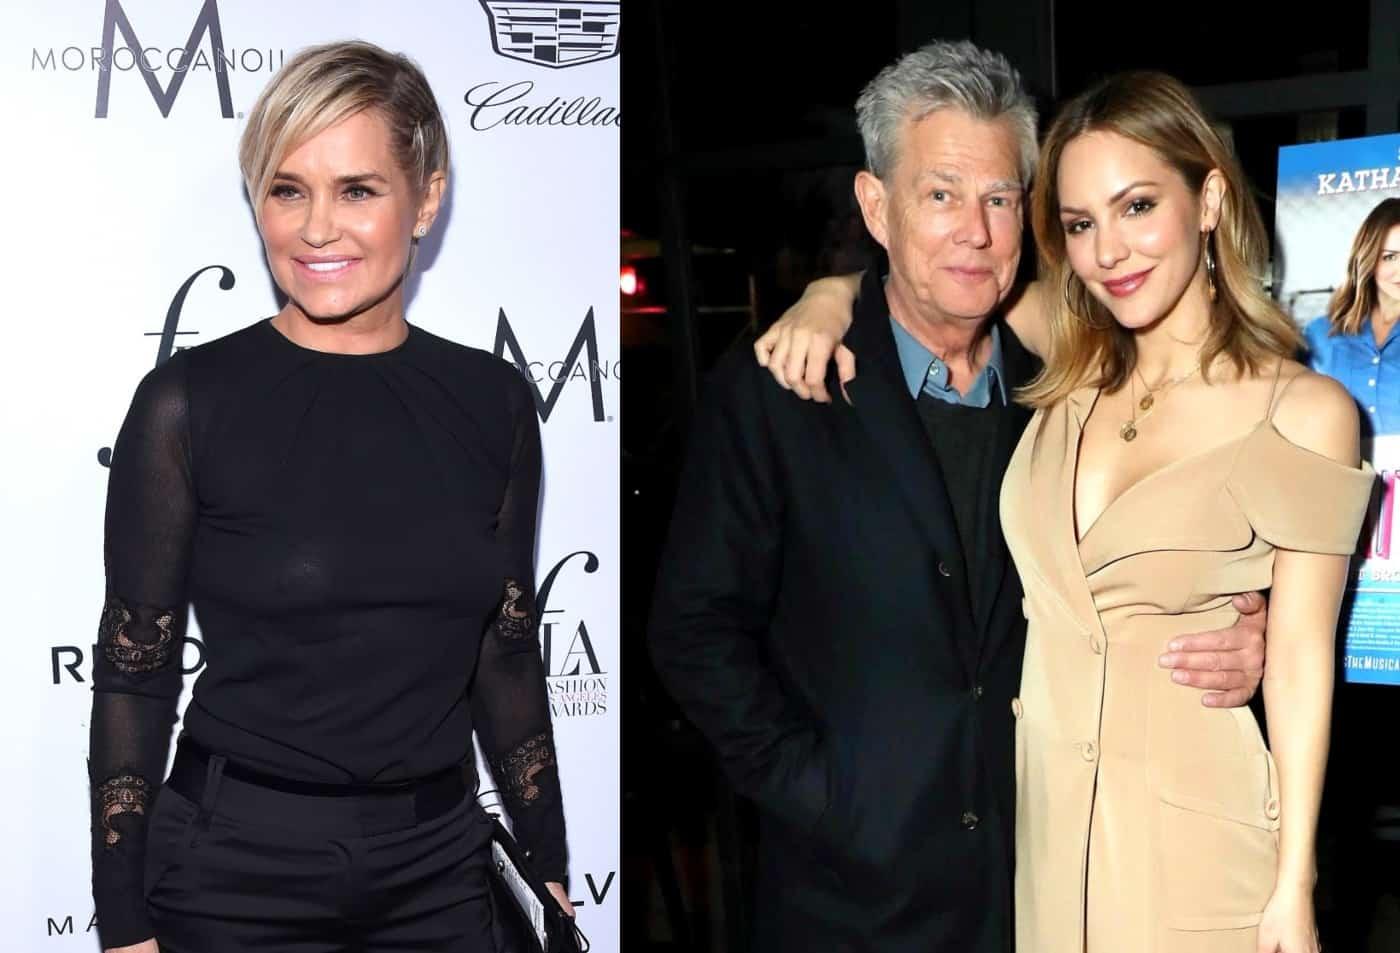 Yolanda Hadid Upset About David Foster Katharine Mcphee S Engagement